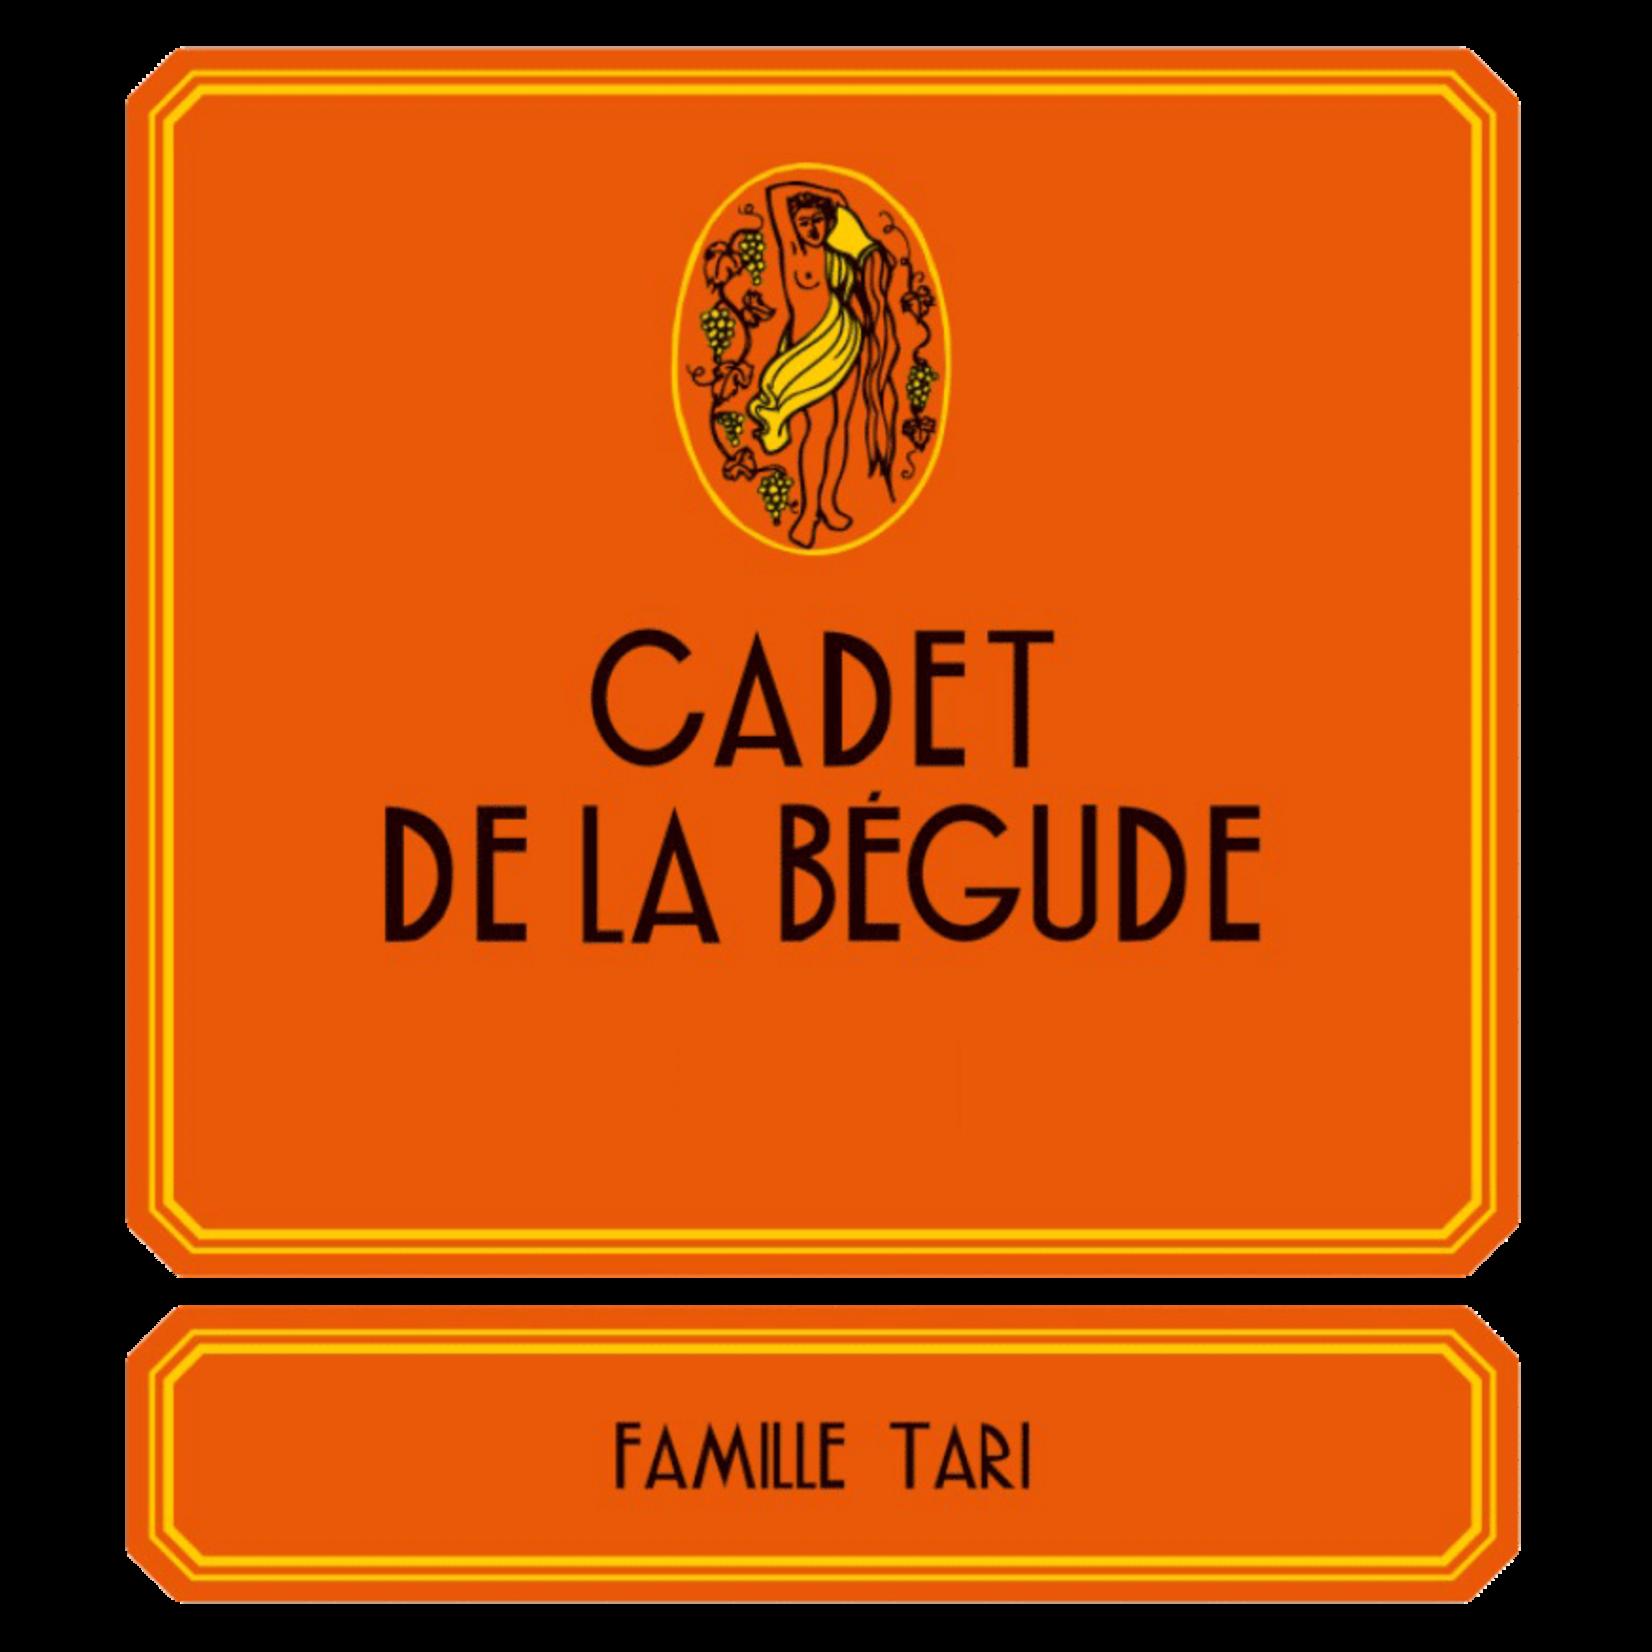 Domaine de la Begude Mediterranee Cadet 2017